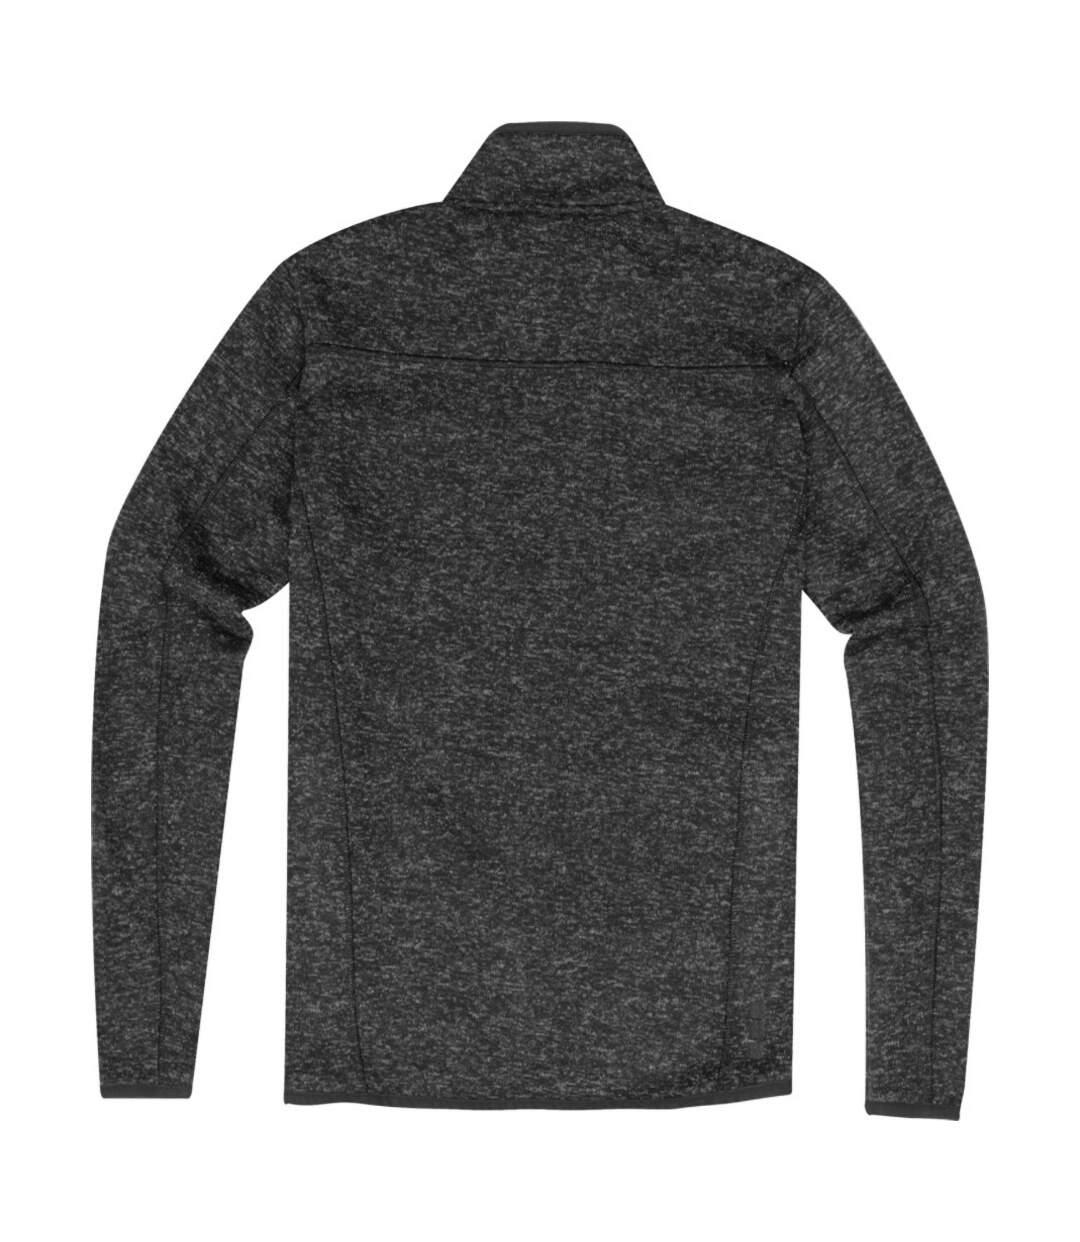 Elevate Mens Tremblant Knit Jacket (Heather Blue) - UTPF1954